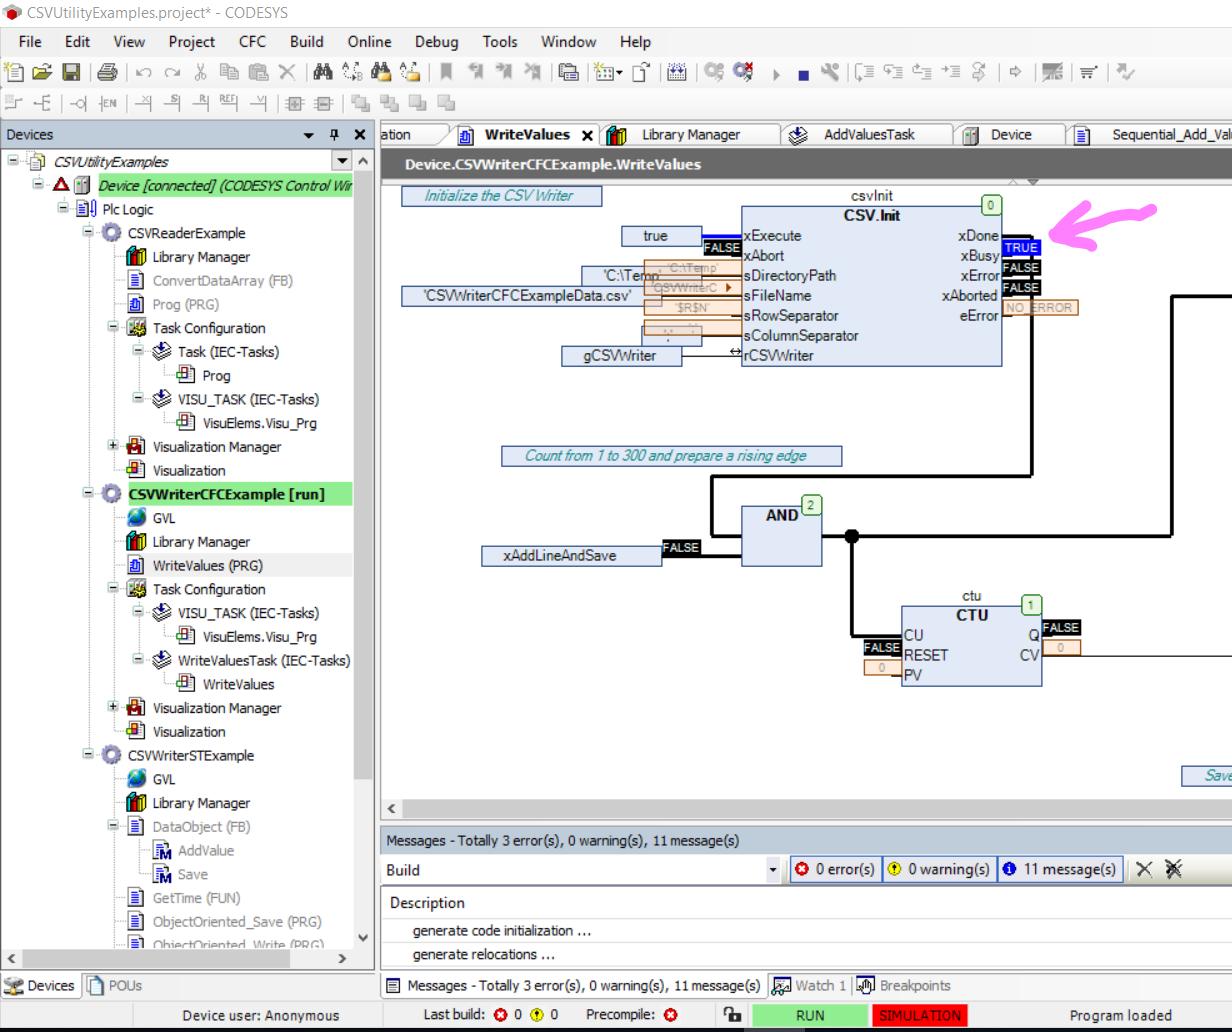 IMG: CSV Utility